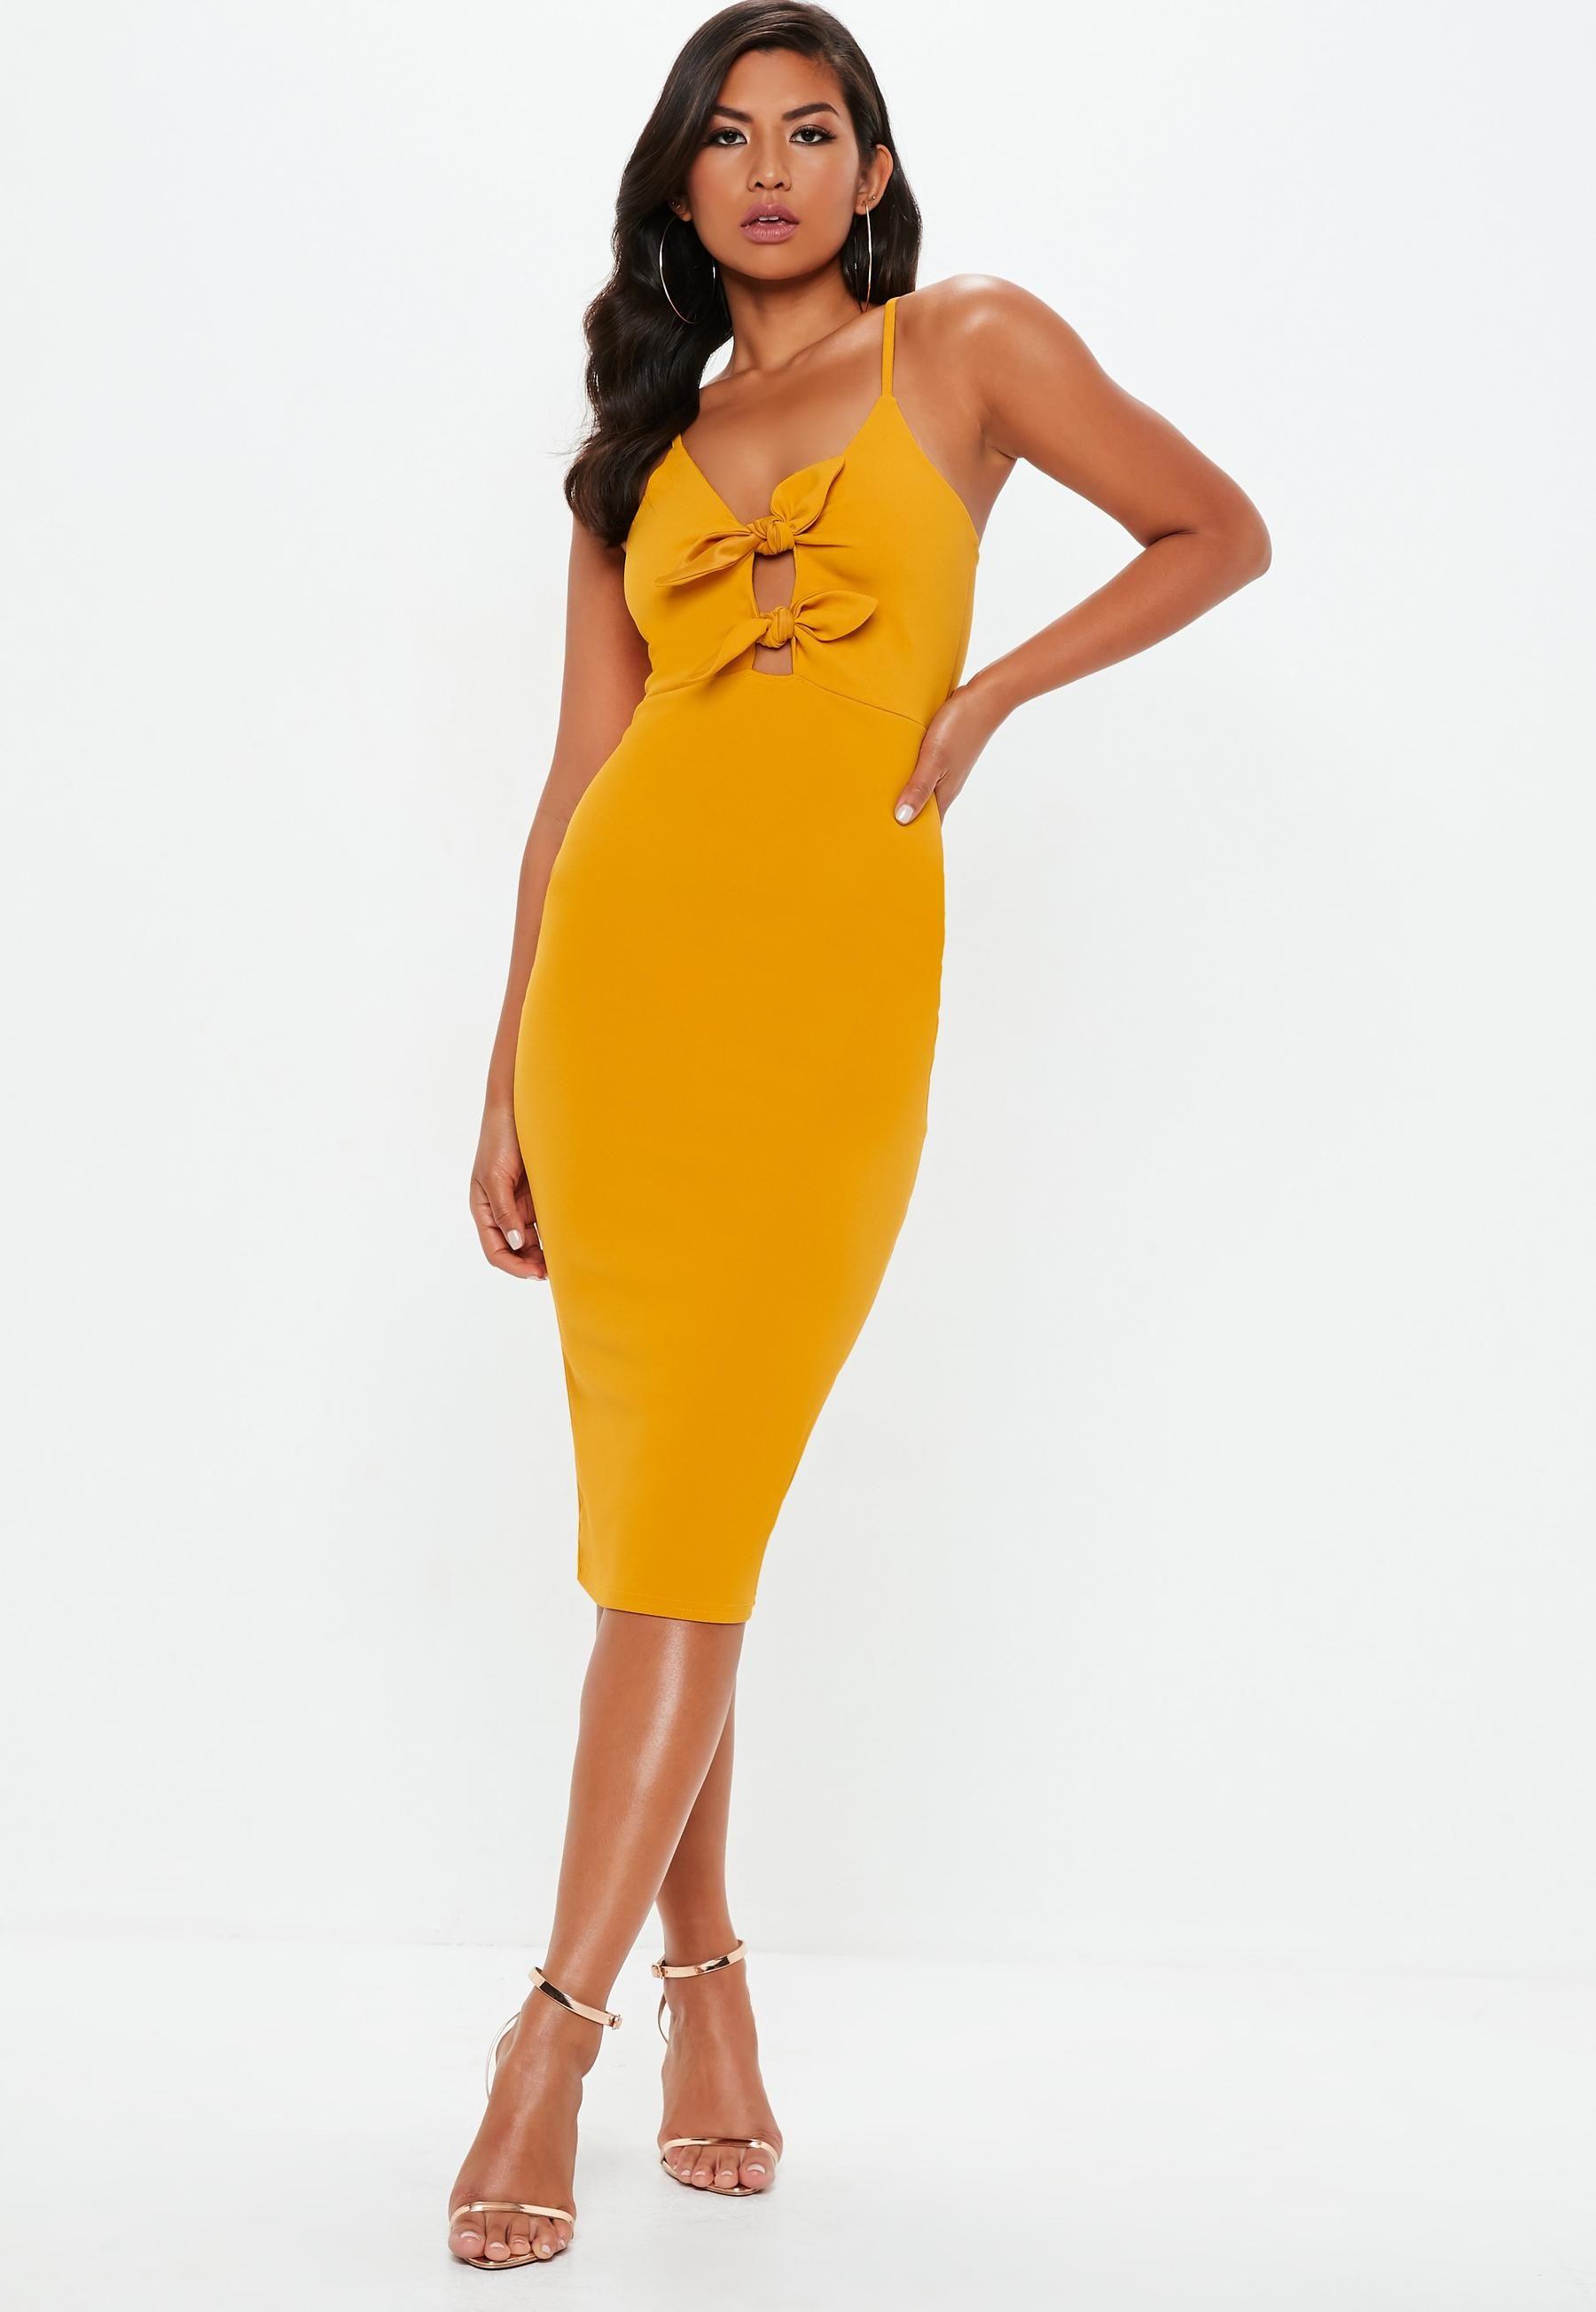 d9c27f9a9556 Black Strappy Tie Front Midi Dress | Outfits | Dresses, 15 dresses ...